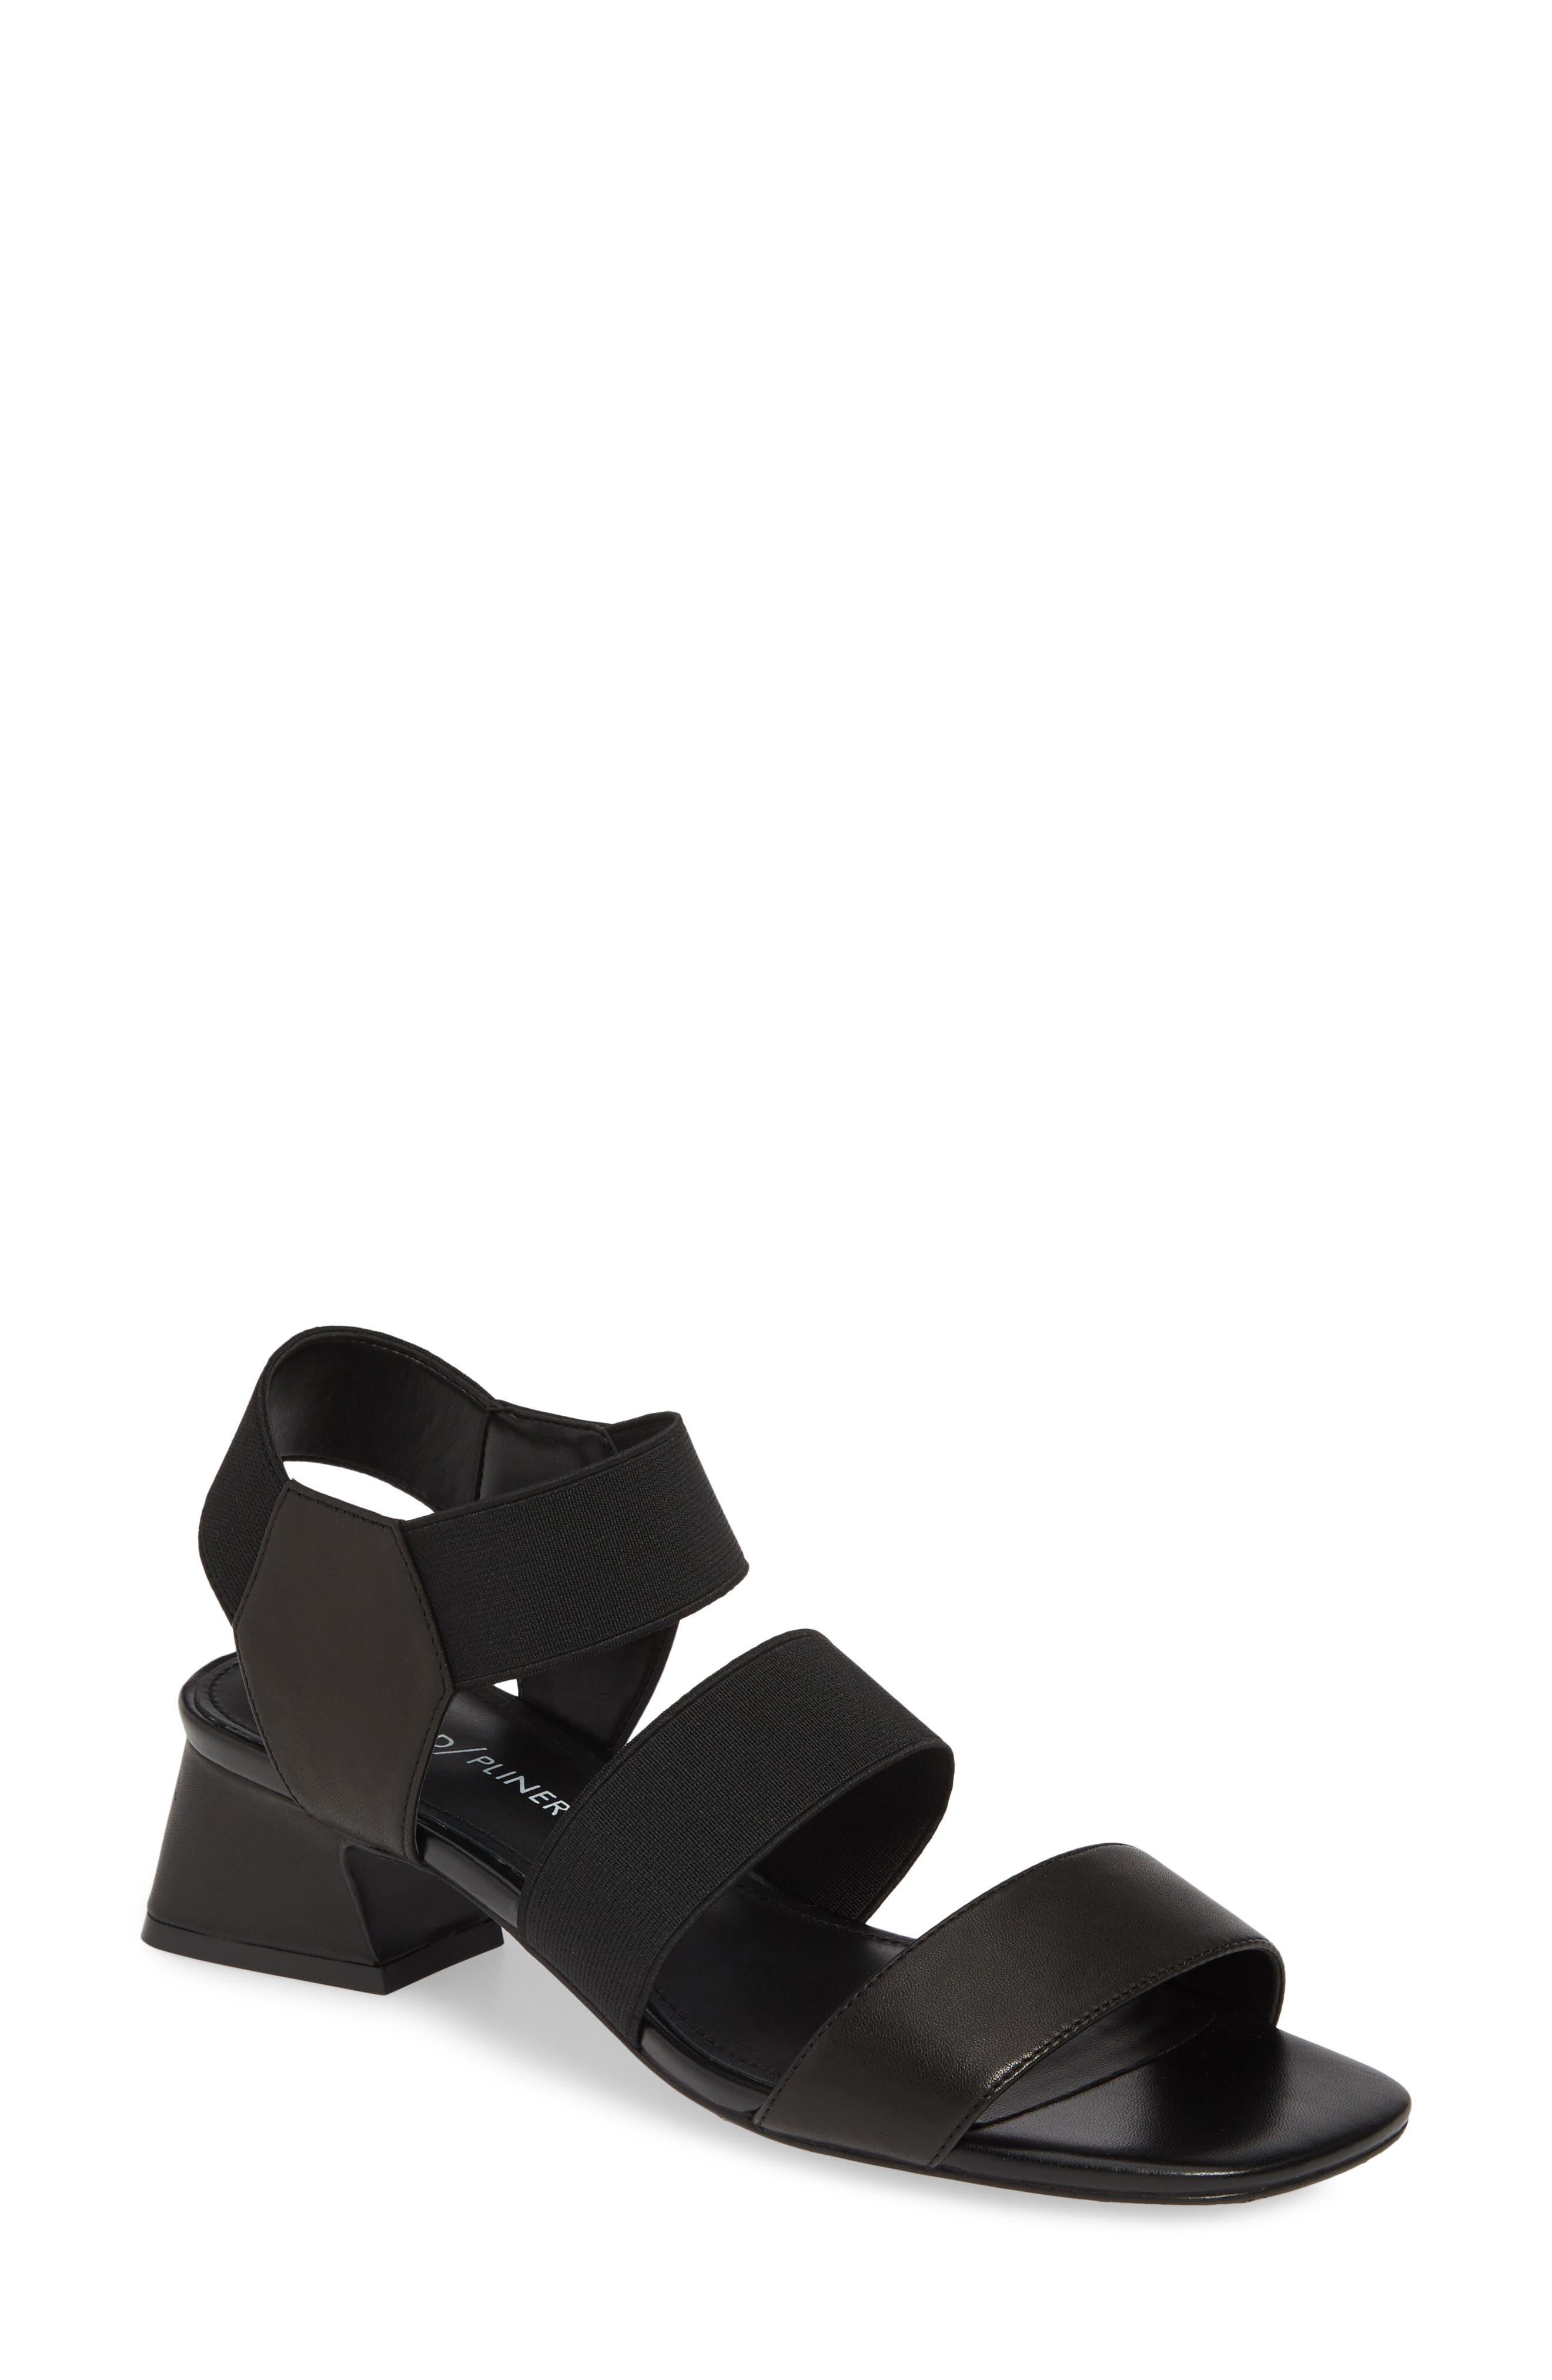 ,                             Britini Sandal,                             Main thumbnail 1, color,                             BLACK LEATHER/ FABRIC